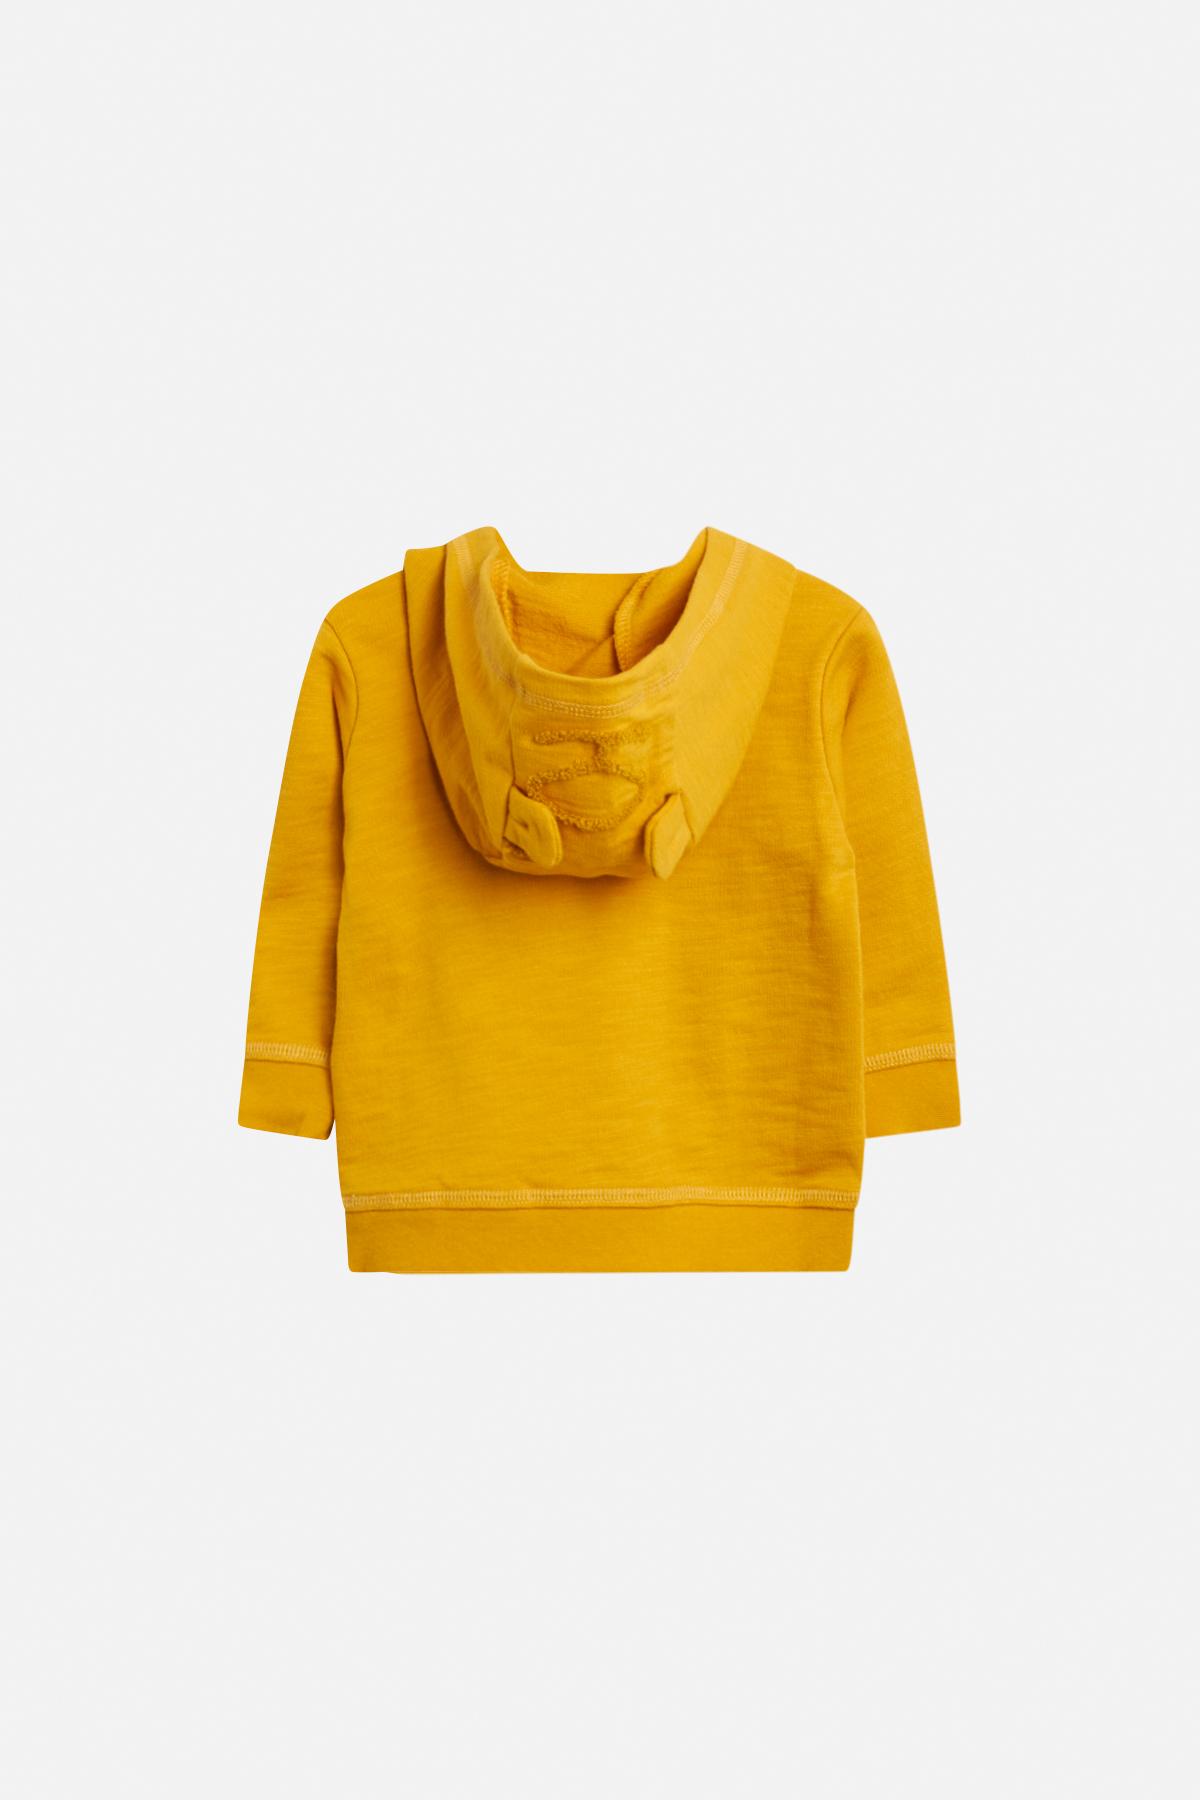 Boy - Samson -Sweatshirt